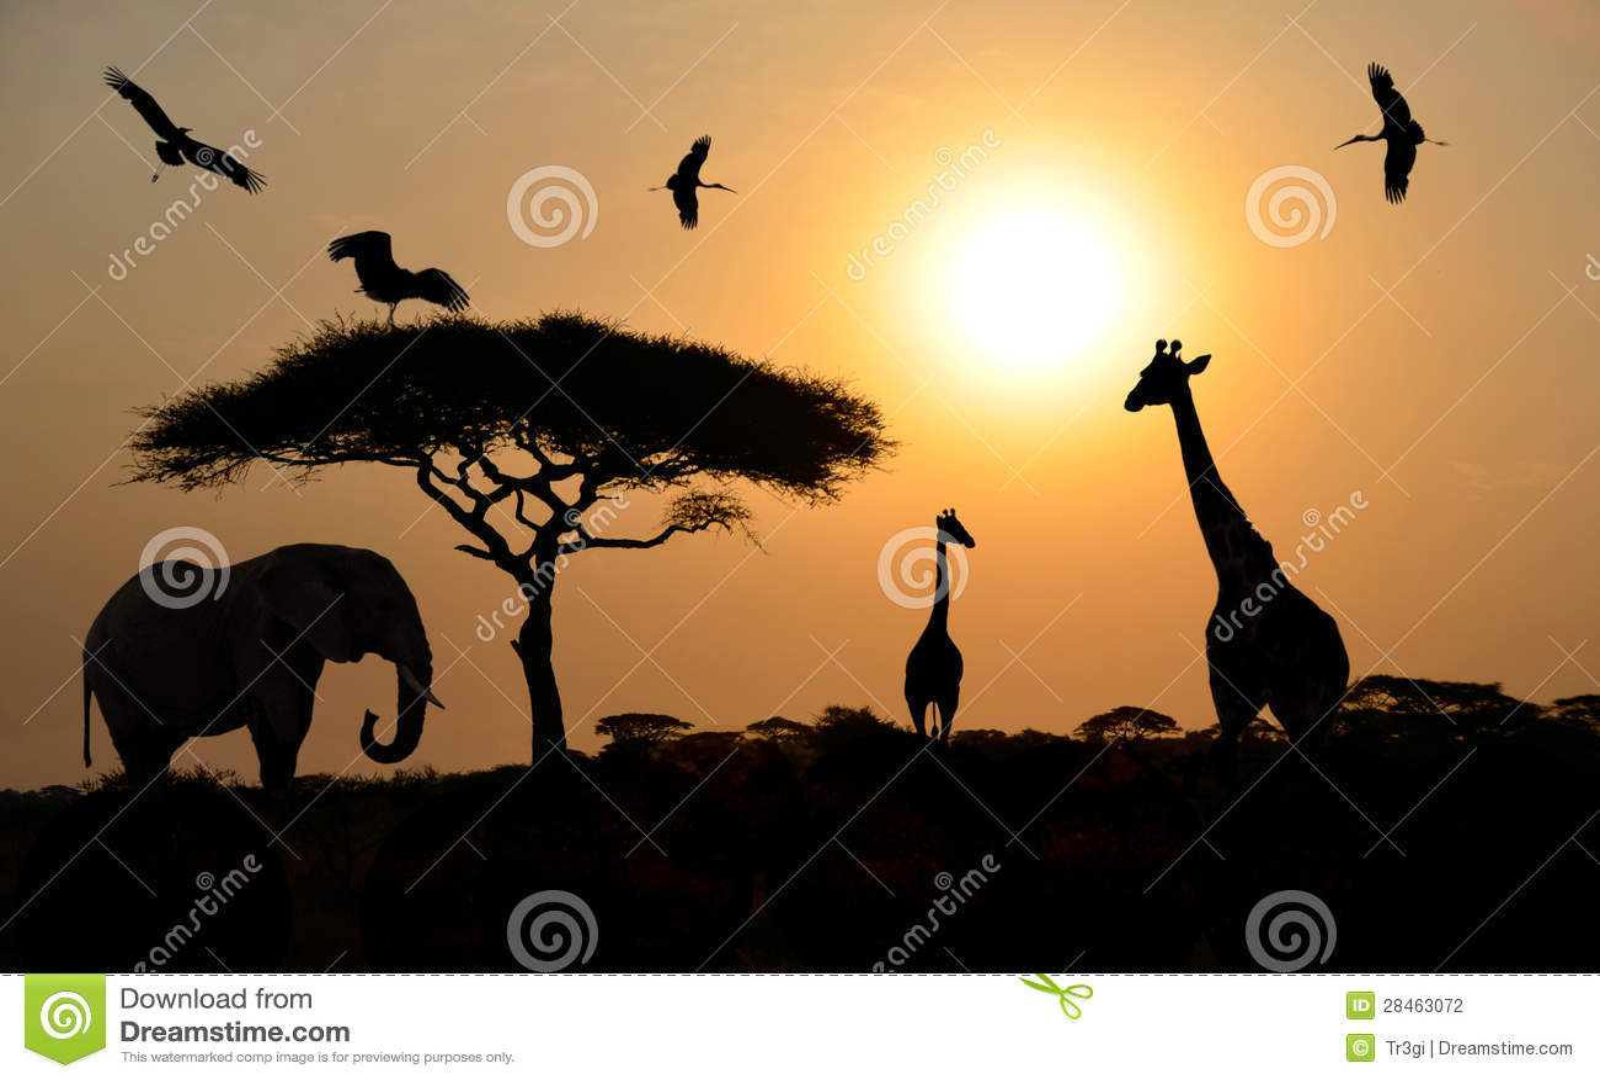 Safari Animal Wallpaper Animal Silhouettes Over Sunset On Safari In African